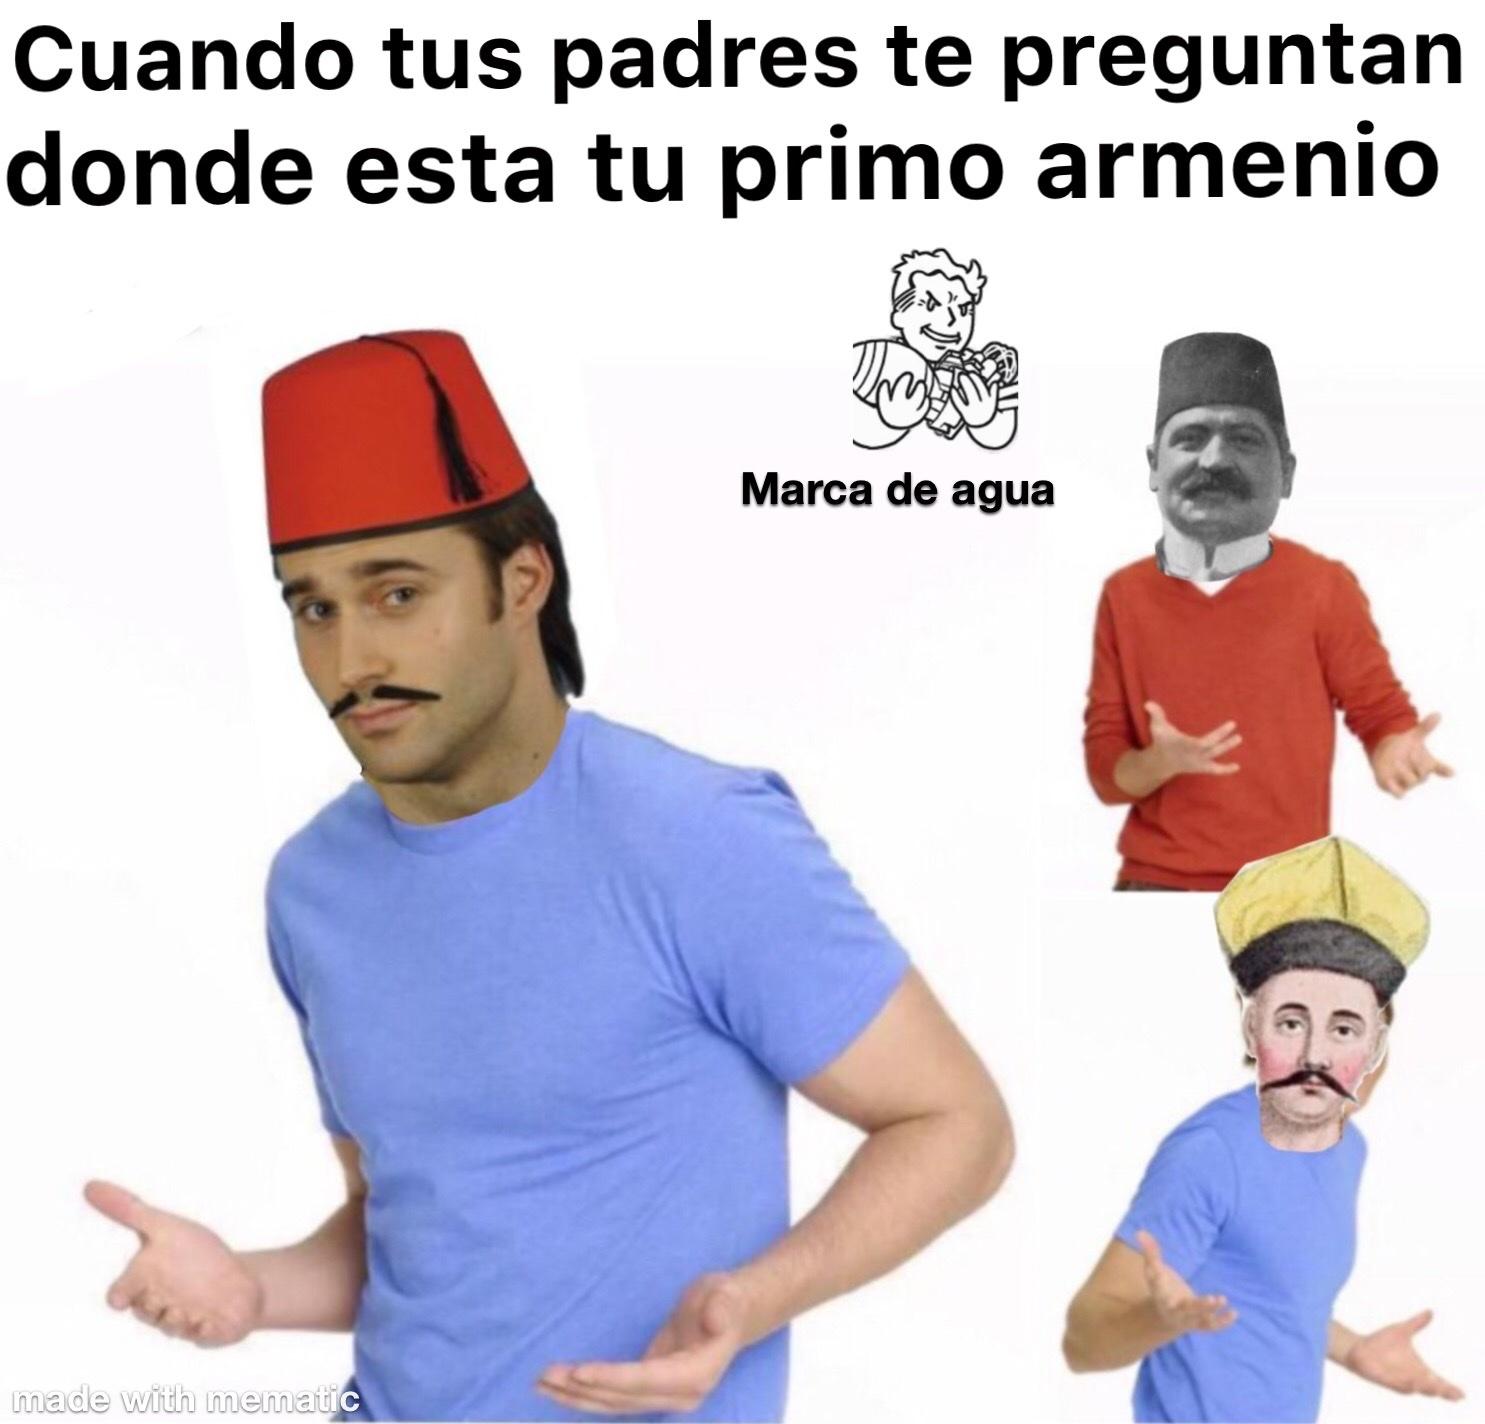 Salió otomano - meme